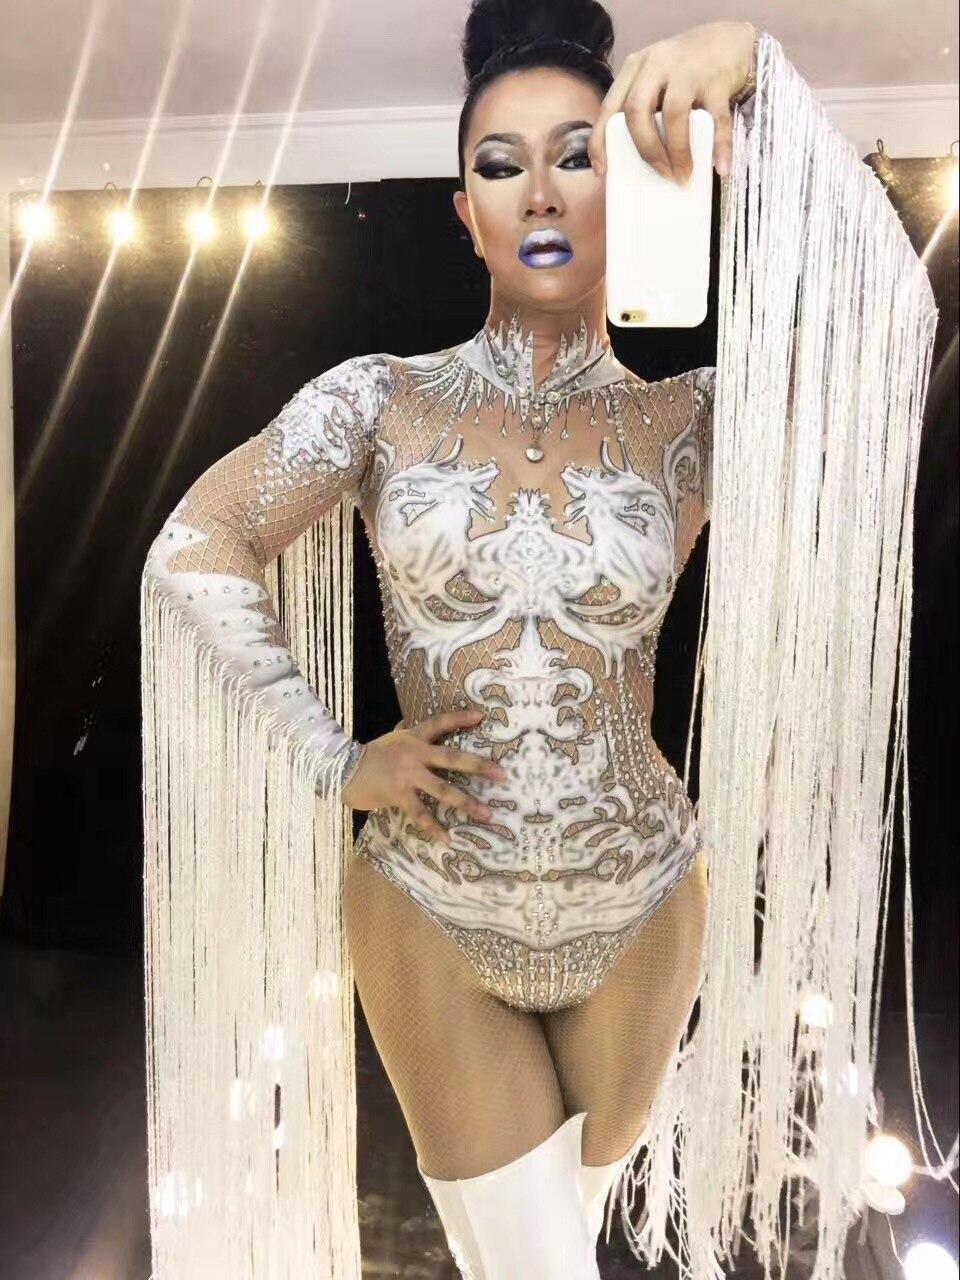 Nude Sexy Tassel Bodysuit Cosplay White Costume Performance Nightclub Women stage dance wear